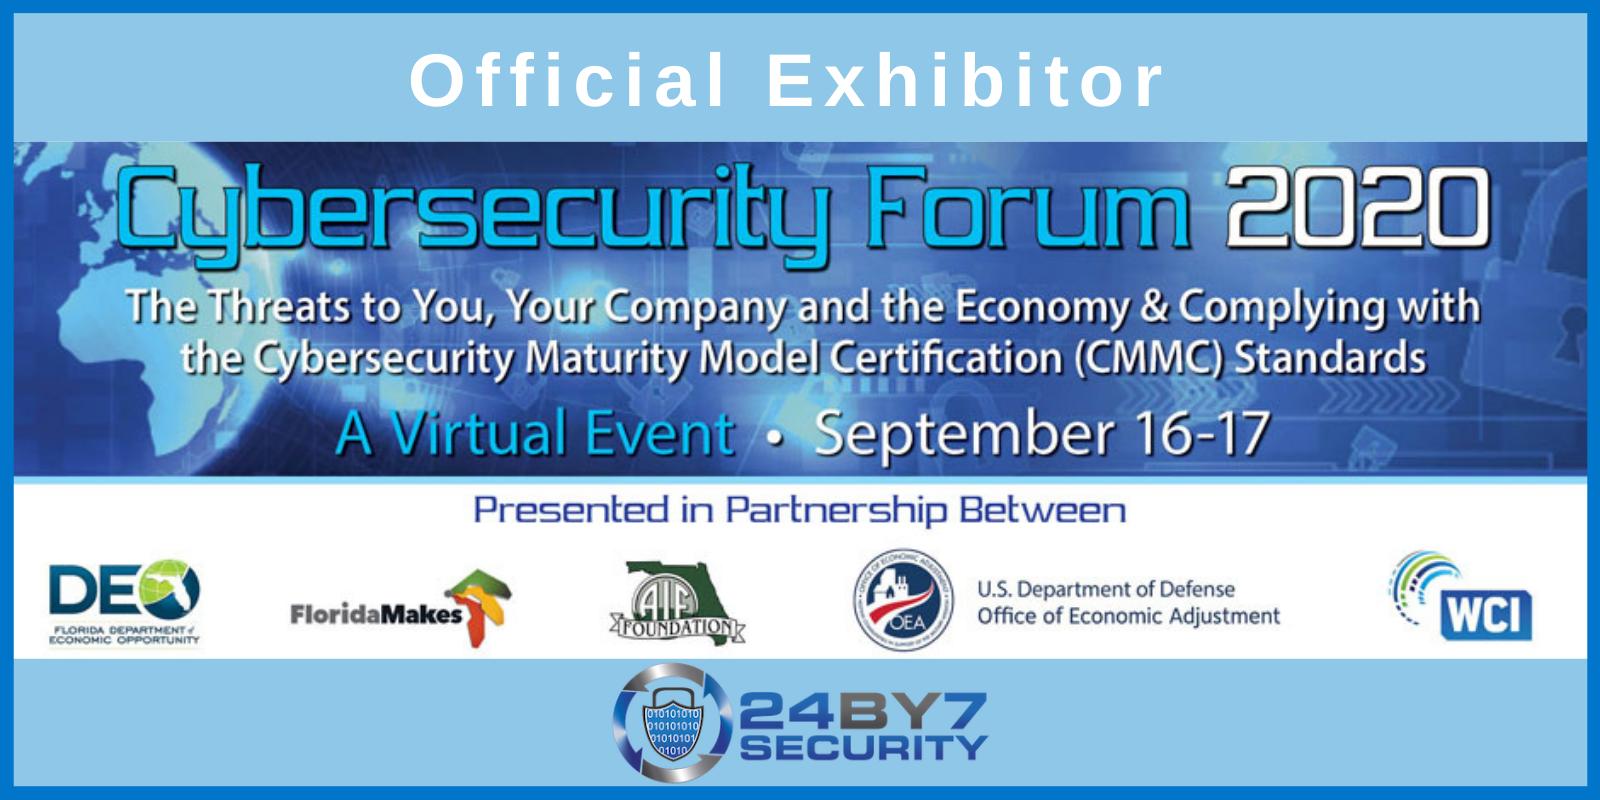 2020 Cybersecurity Forum Virtual Sept